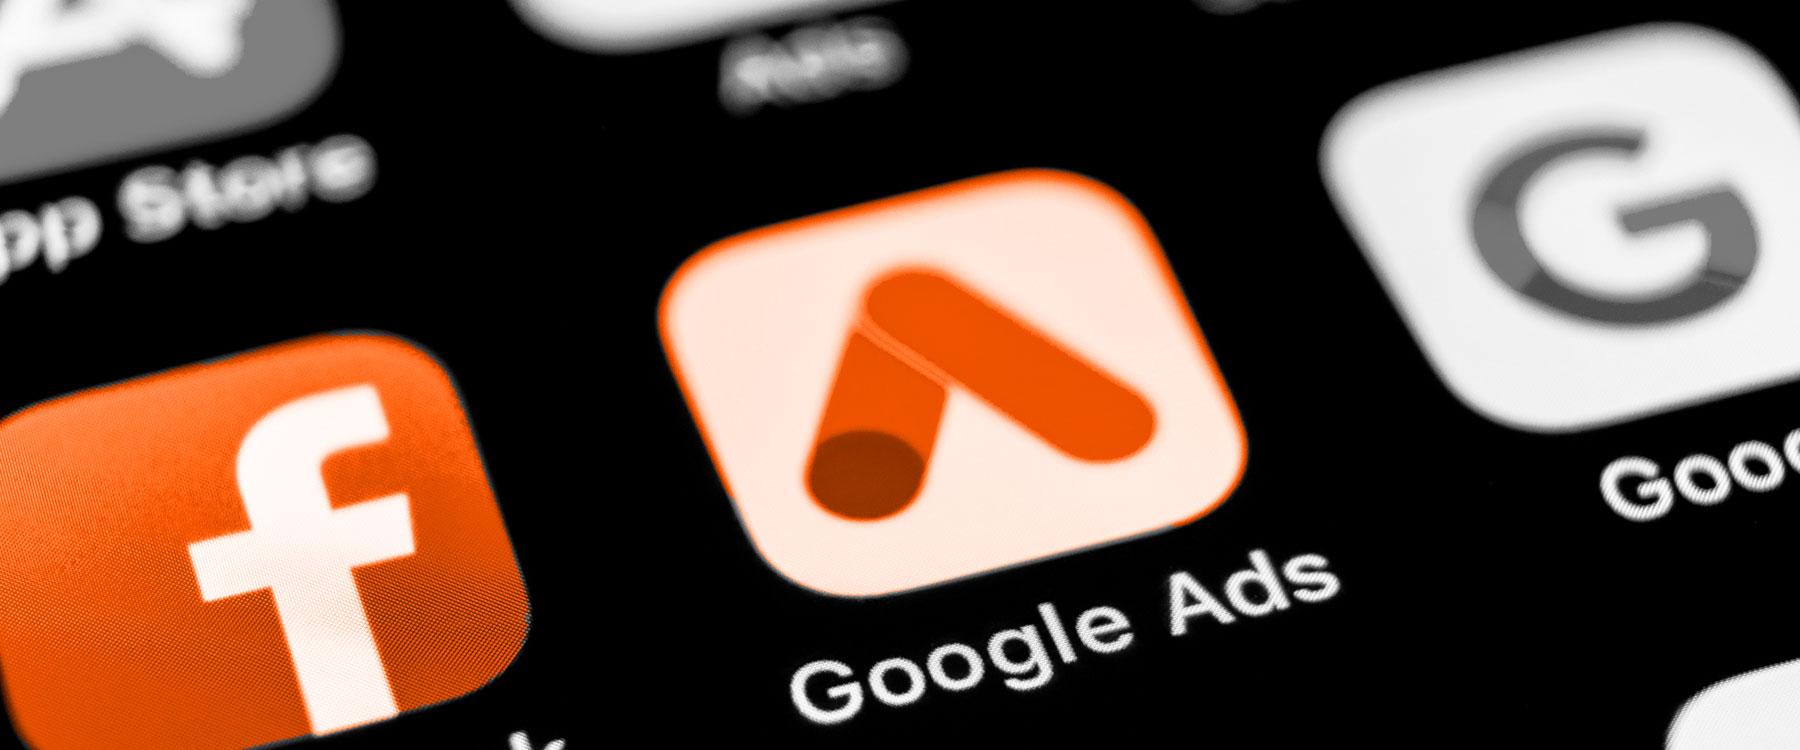 Google Ads, App-Icon